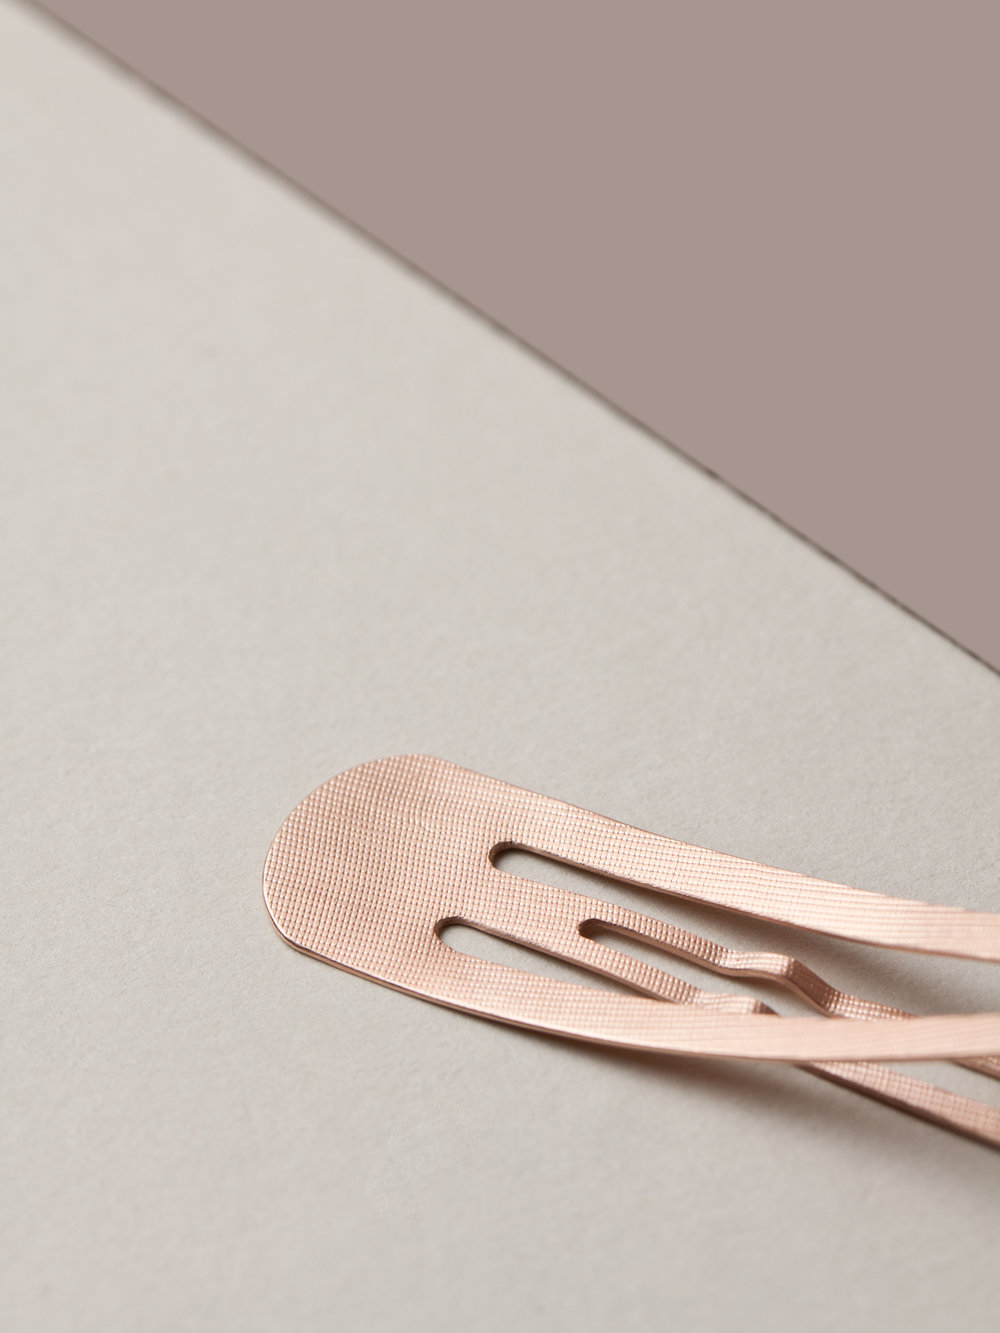 Christina Pauls, Haarschmuck minimalistisch in Rosegold